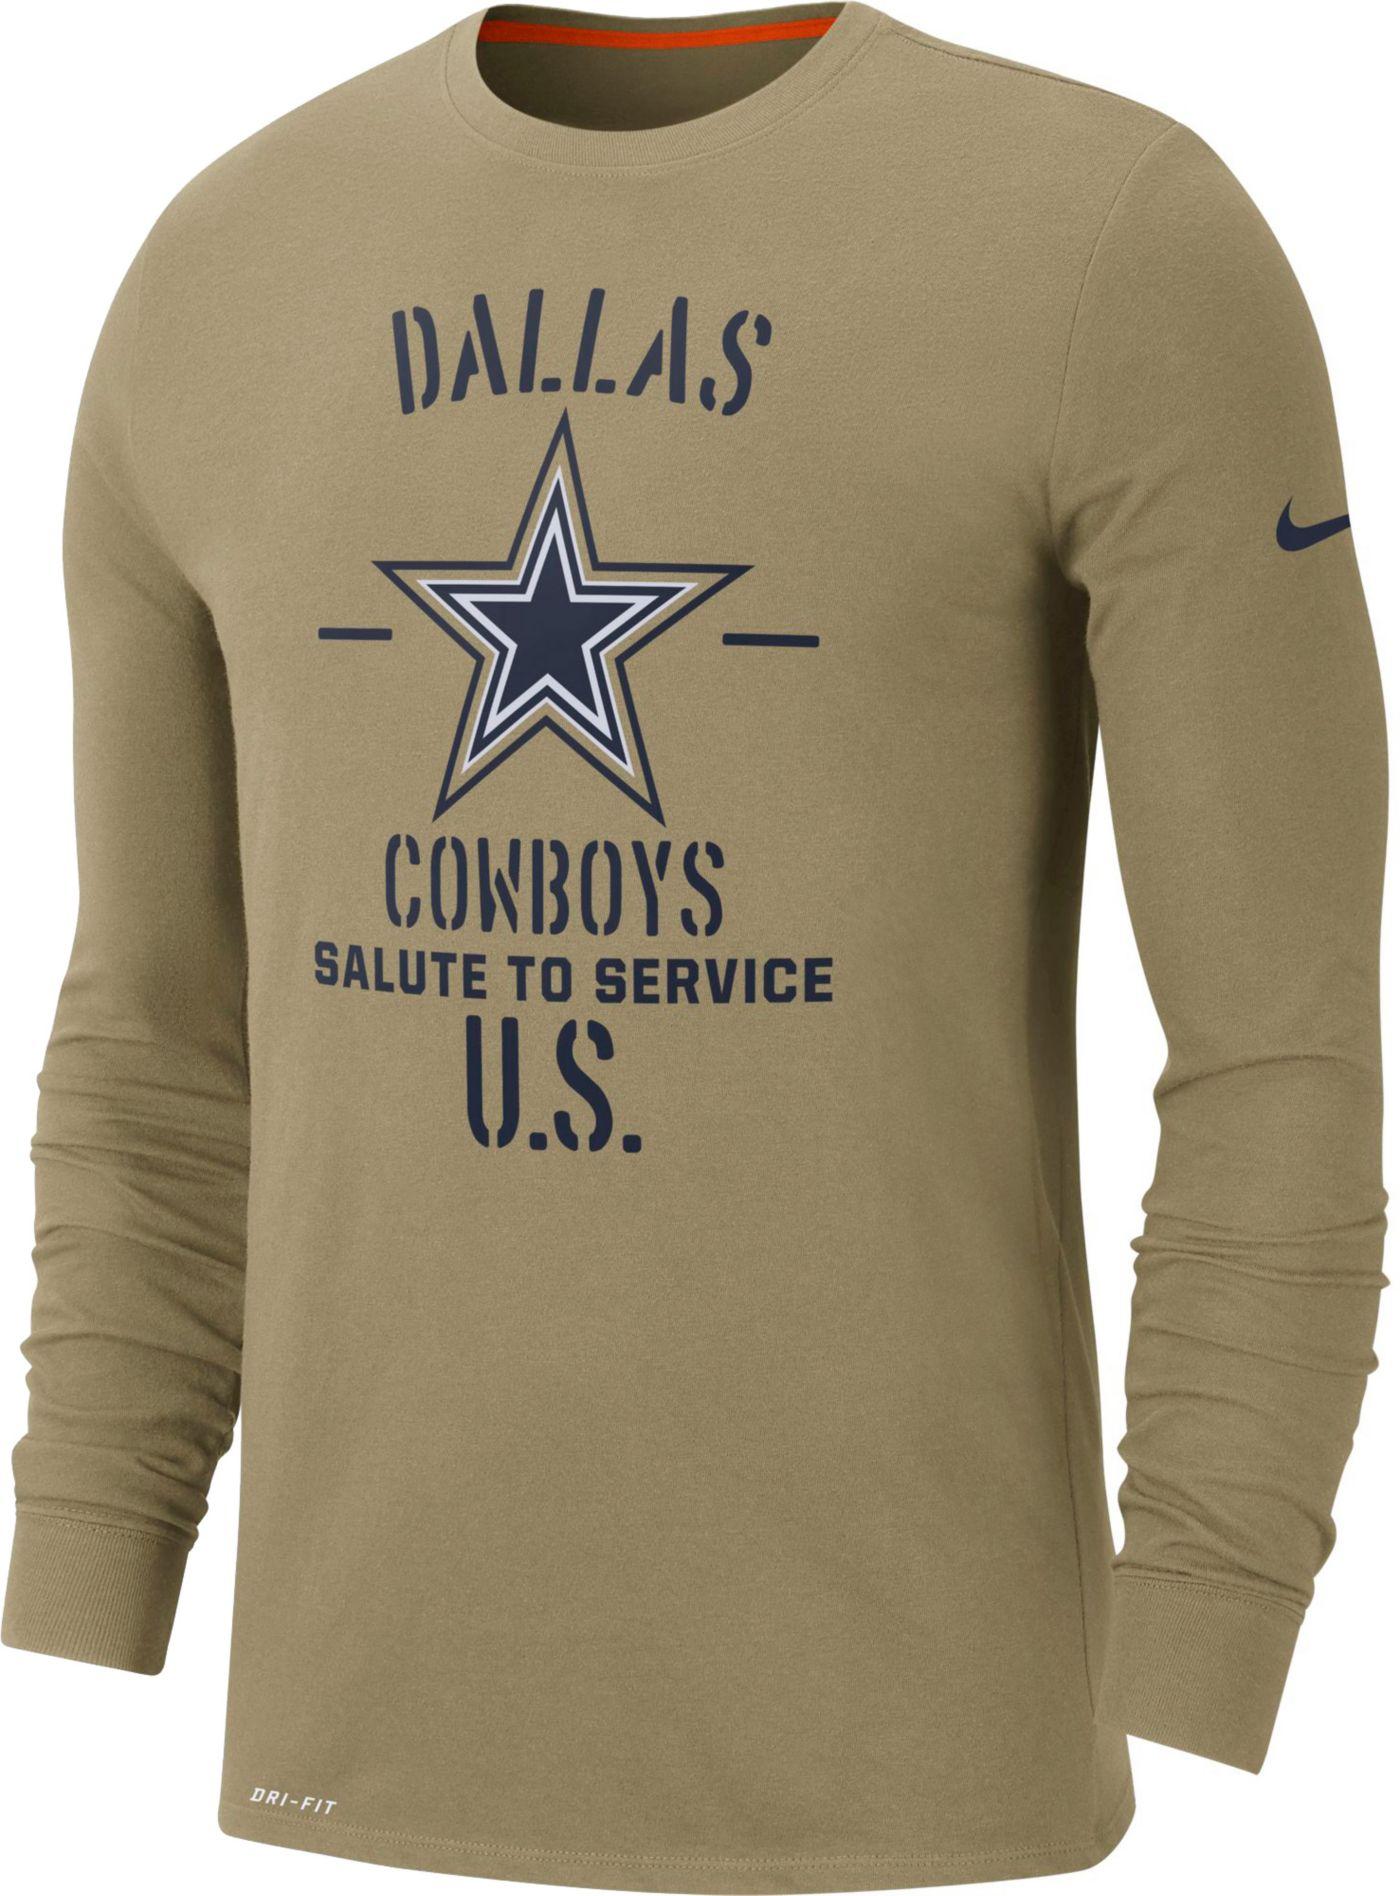 Nike Men's Salute to Service Dallas Cowboys Dri-FIT Beige Long Sleeve Shirt